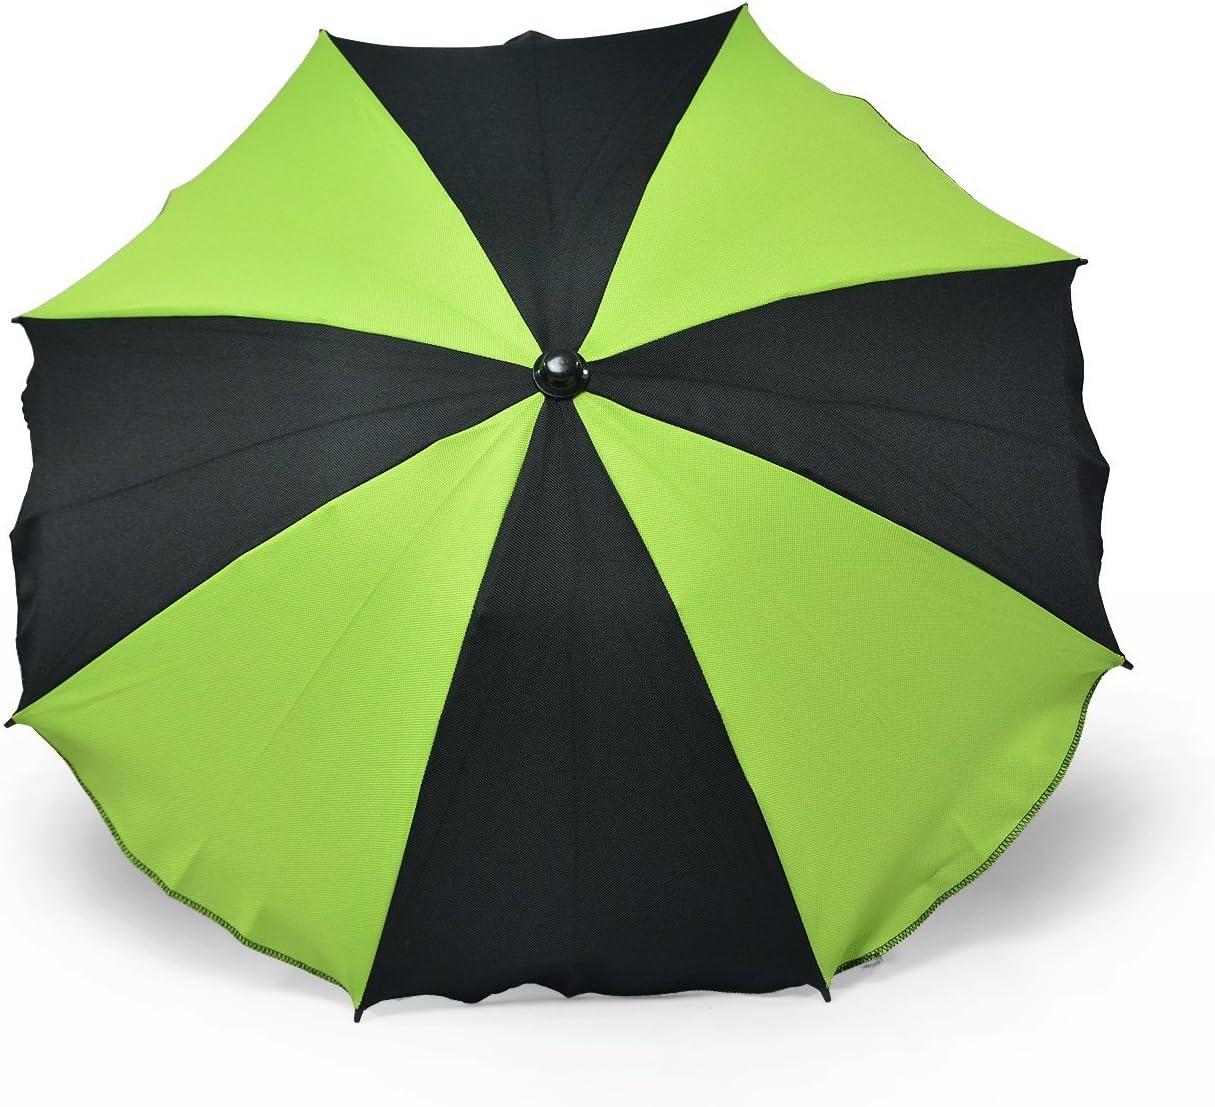 UV schutz50/+ toldo Protecci/ón Solar pantalla para cochecito de beb/é con soporte universal dos colores Brown-Cremes Universal sombrilla paraguas para carrito y Sport Buggy